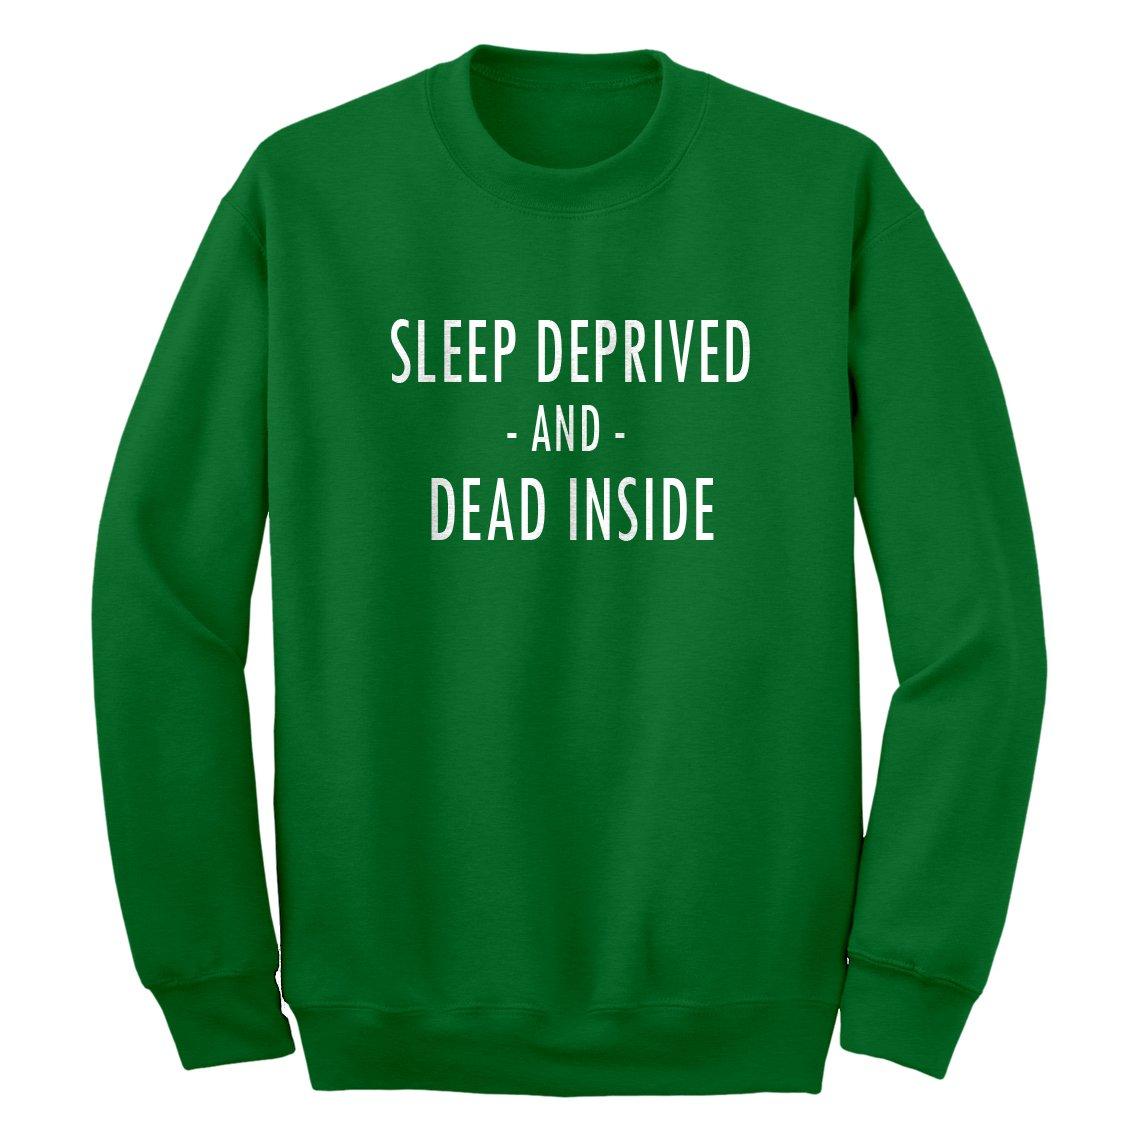 Indica Plateau Sleep Deprived and Dead Inside Sweatshirt 3555-C